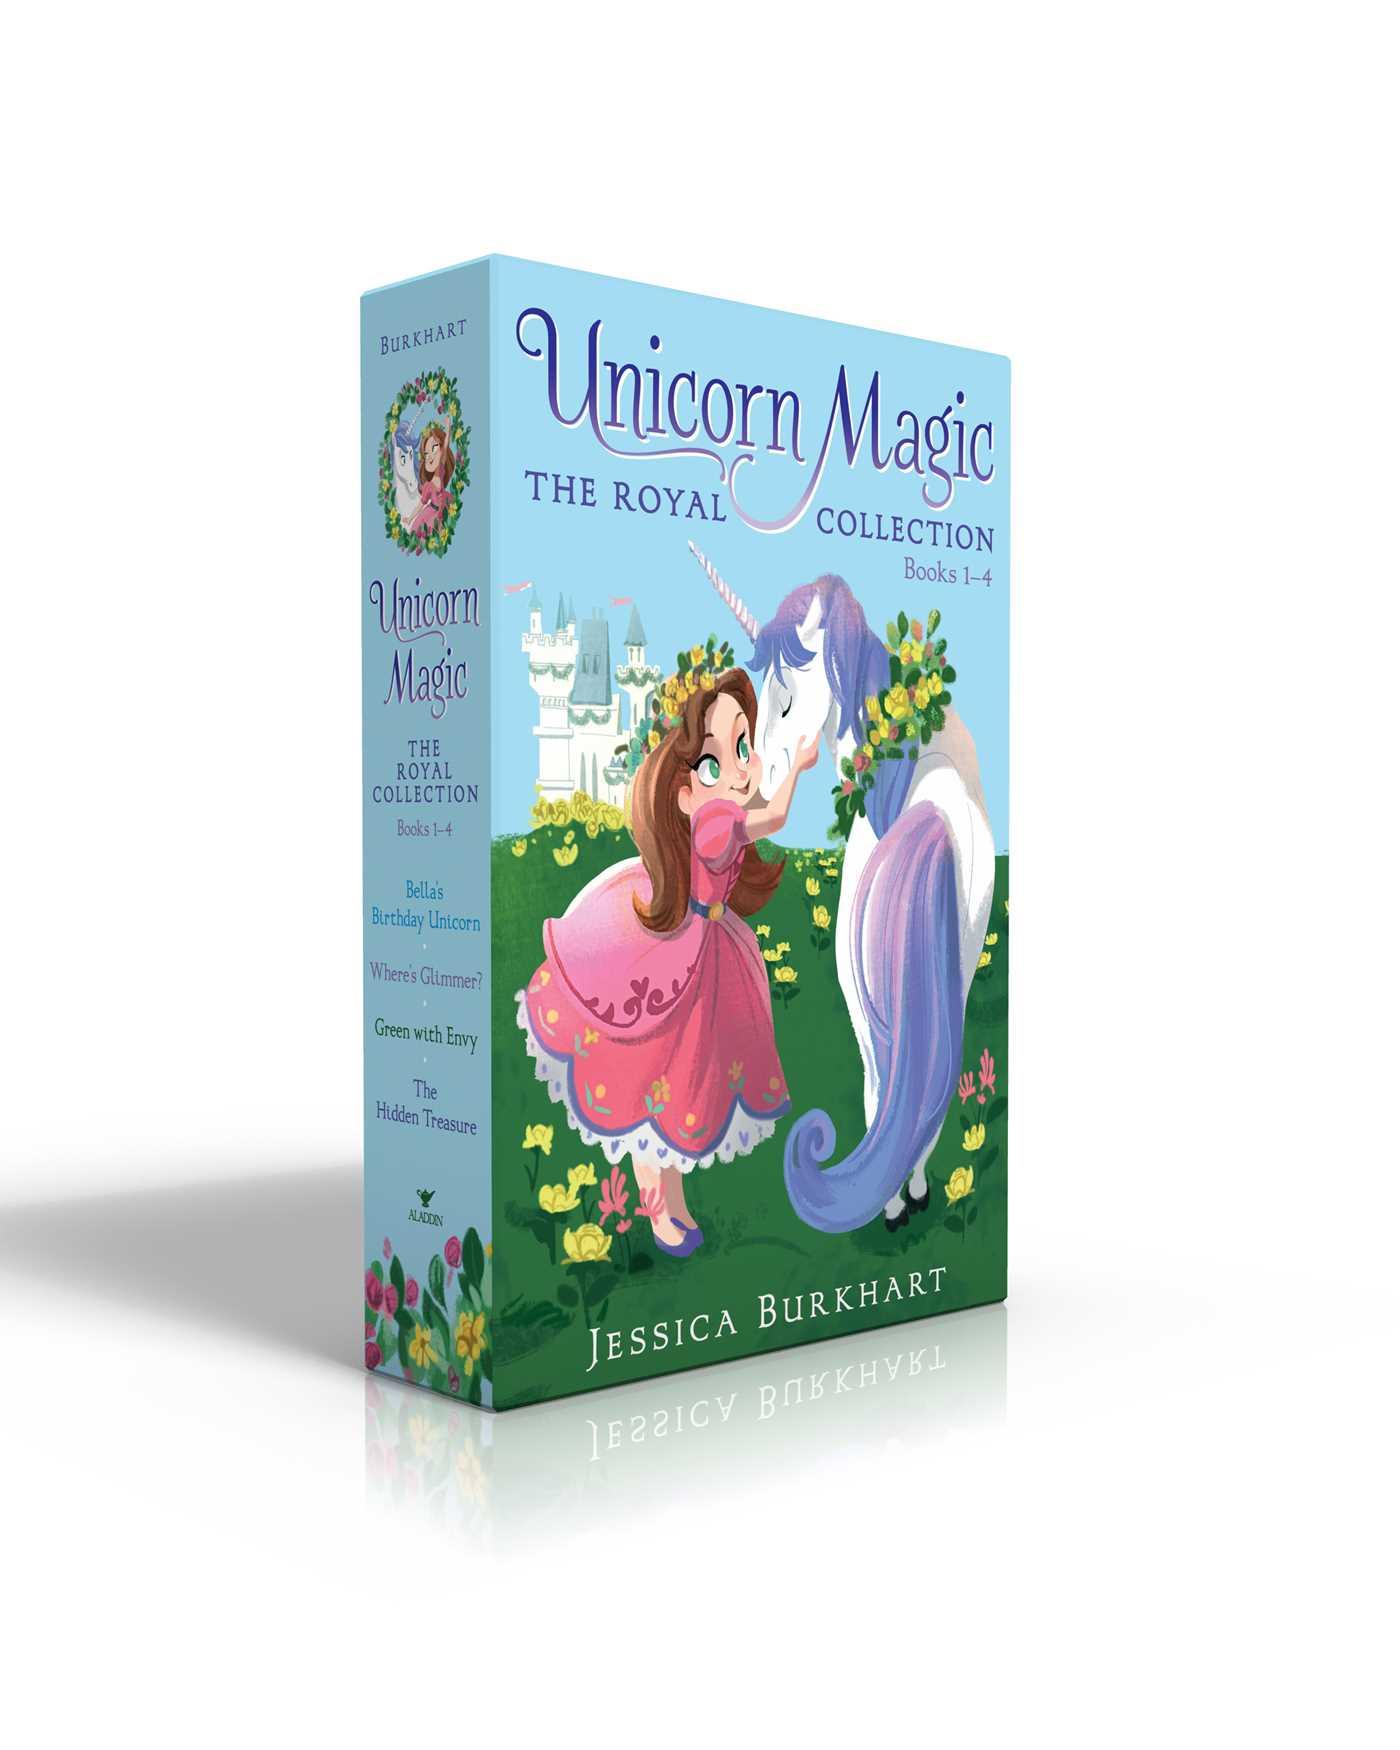 Unicorn magic the royal collection books 1 4 9781534406186 hr